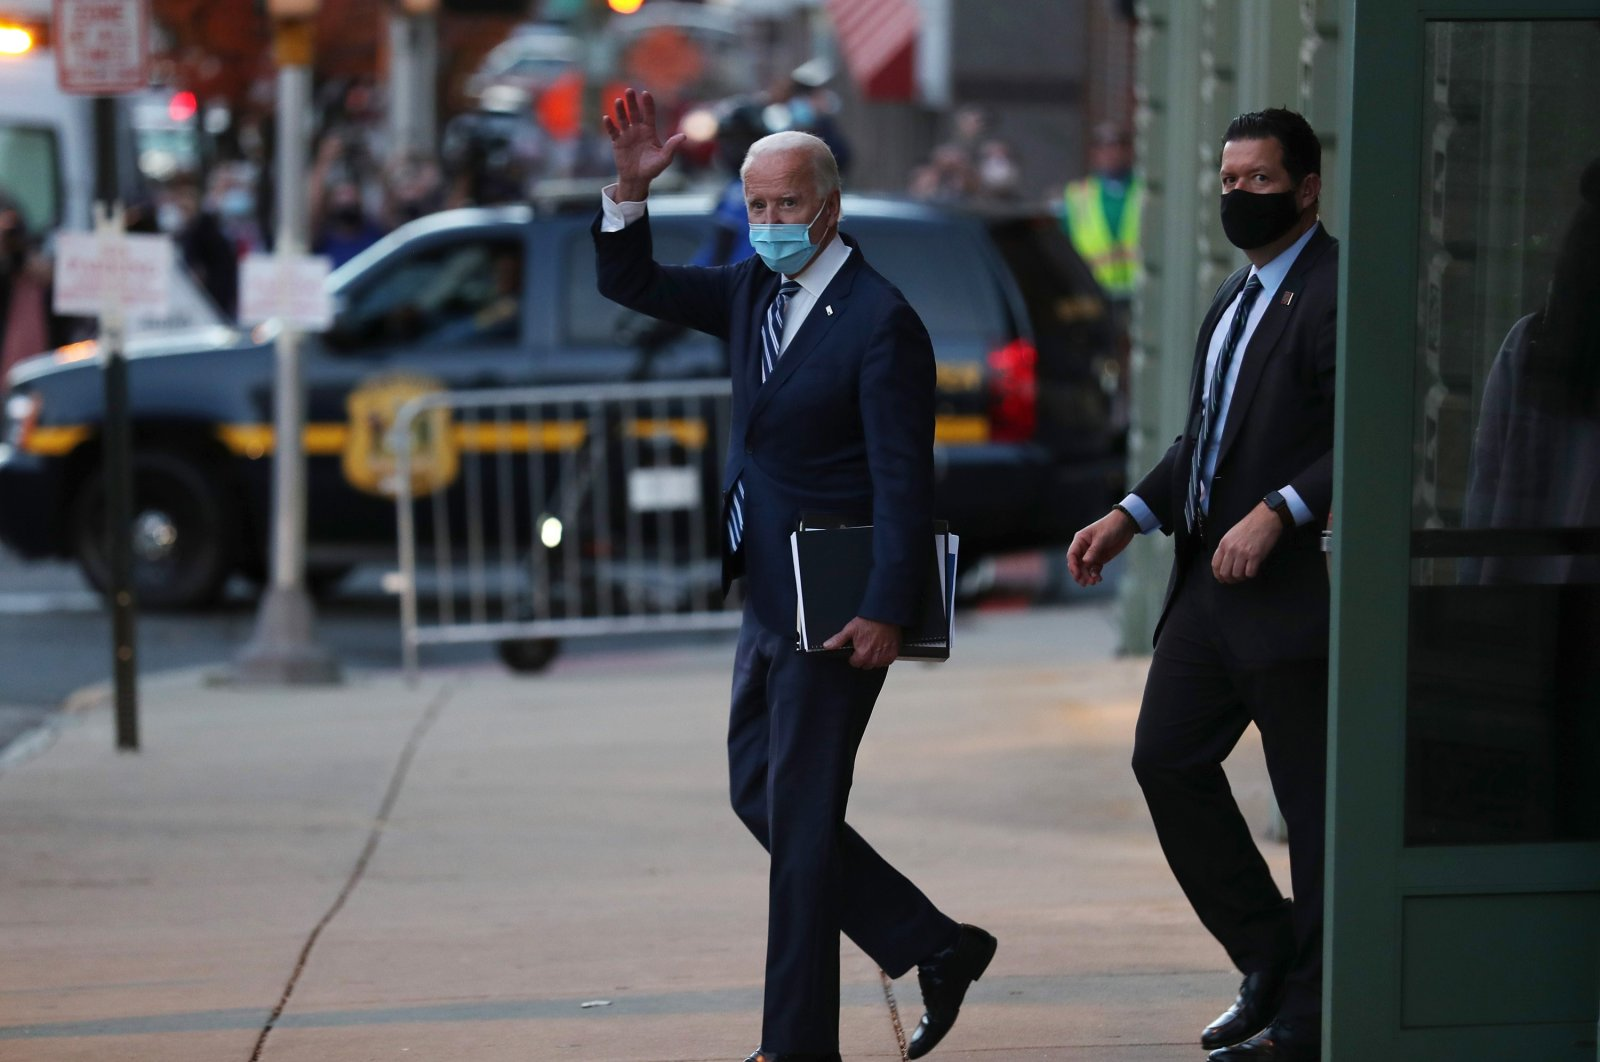 U.S. President-elect Joe Biden waves as he leaves the Queen Theater, in Wilmington, Delaware, the U.S., Nov. 10, 2020. (AFP Photo)